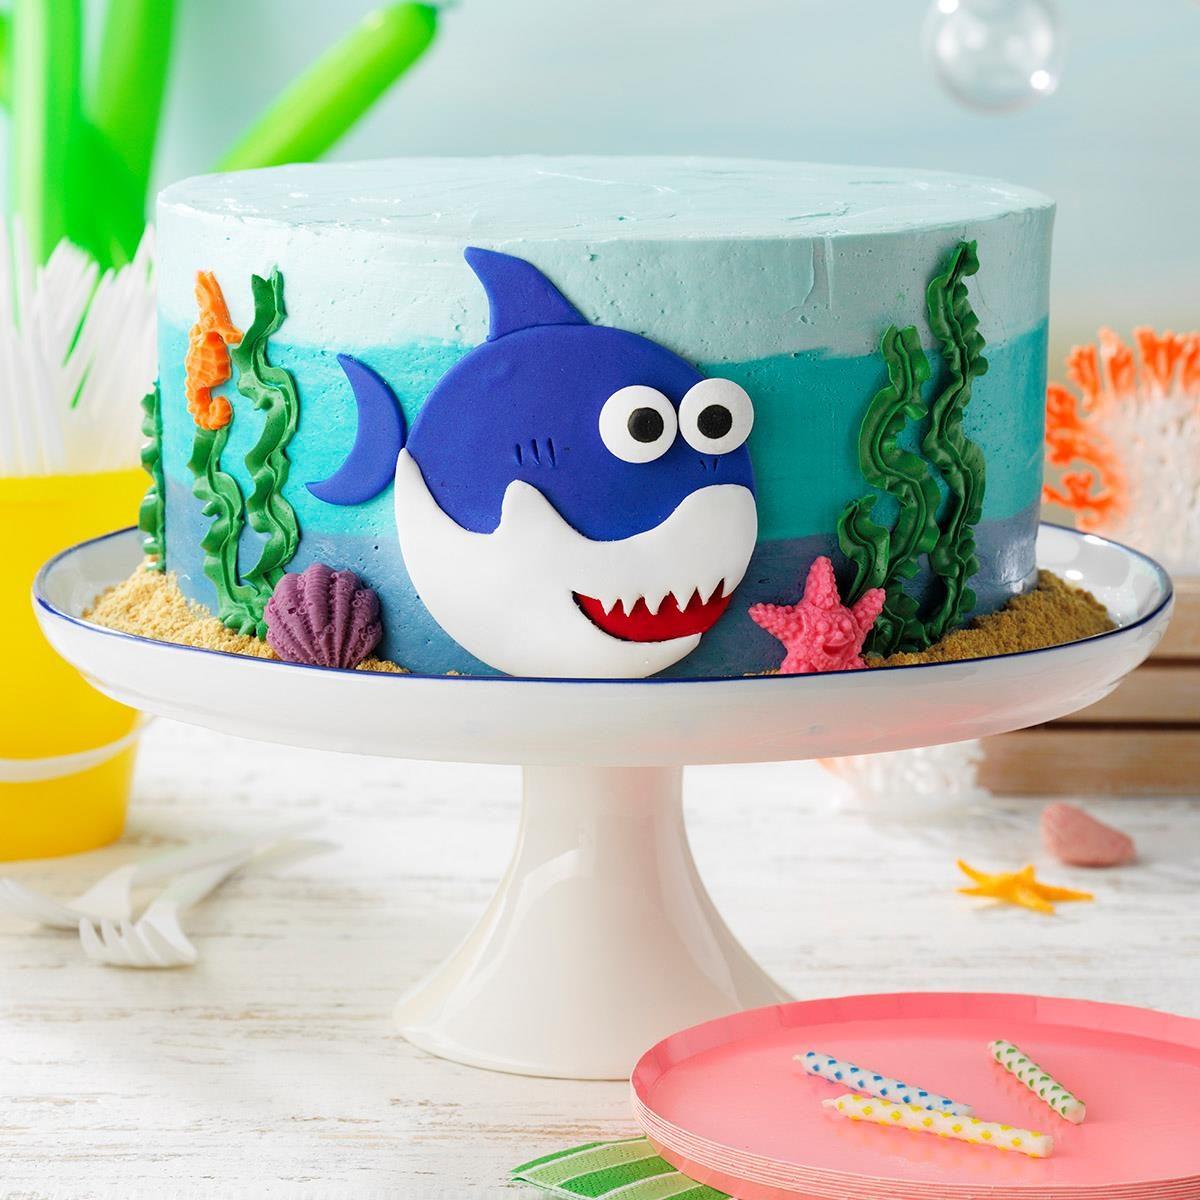 Baby Shark Cake Recipe How To Make It Taste Of Home